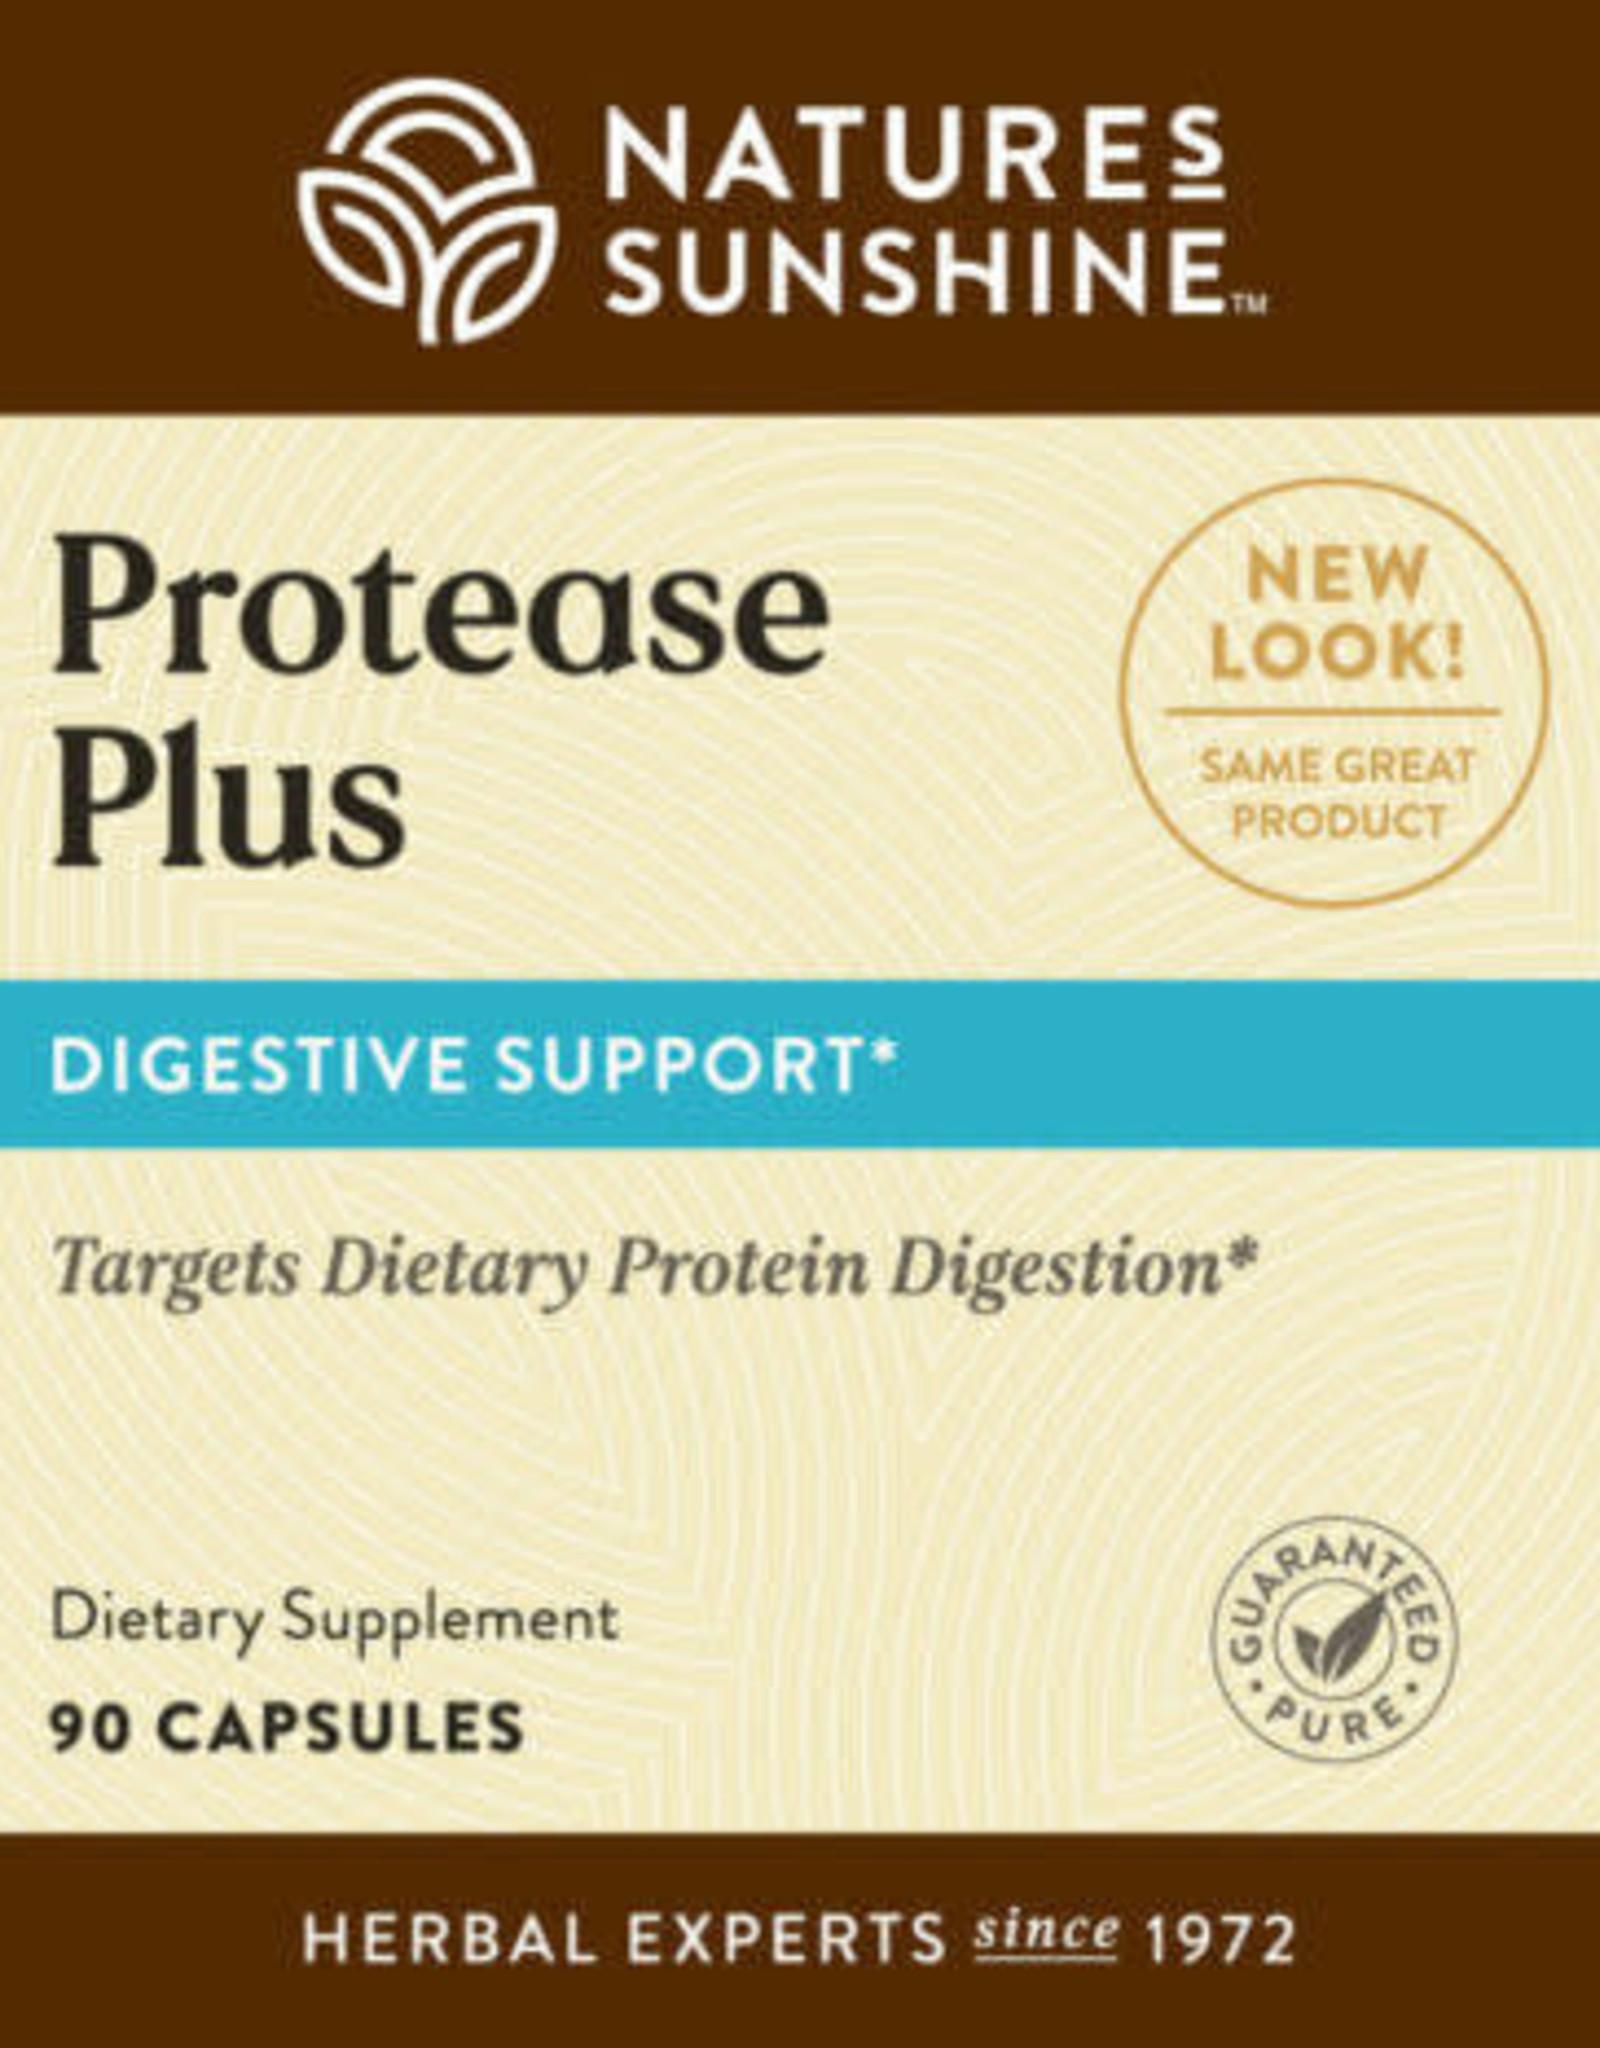 Nature's Sunshine Protease Plus